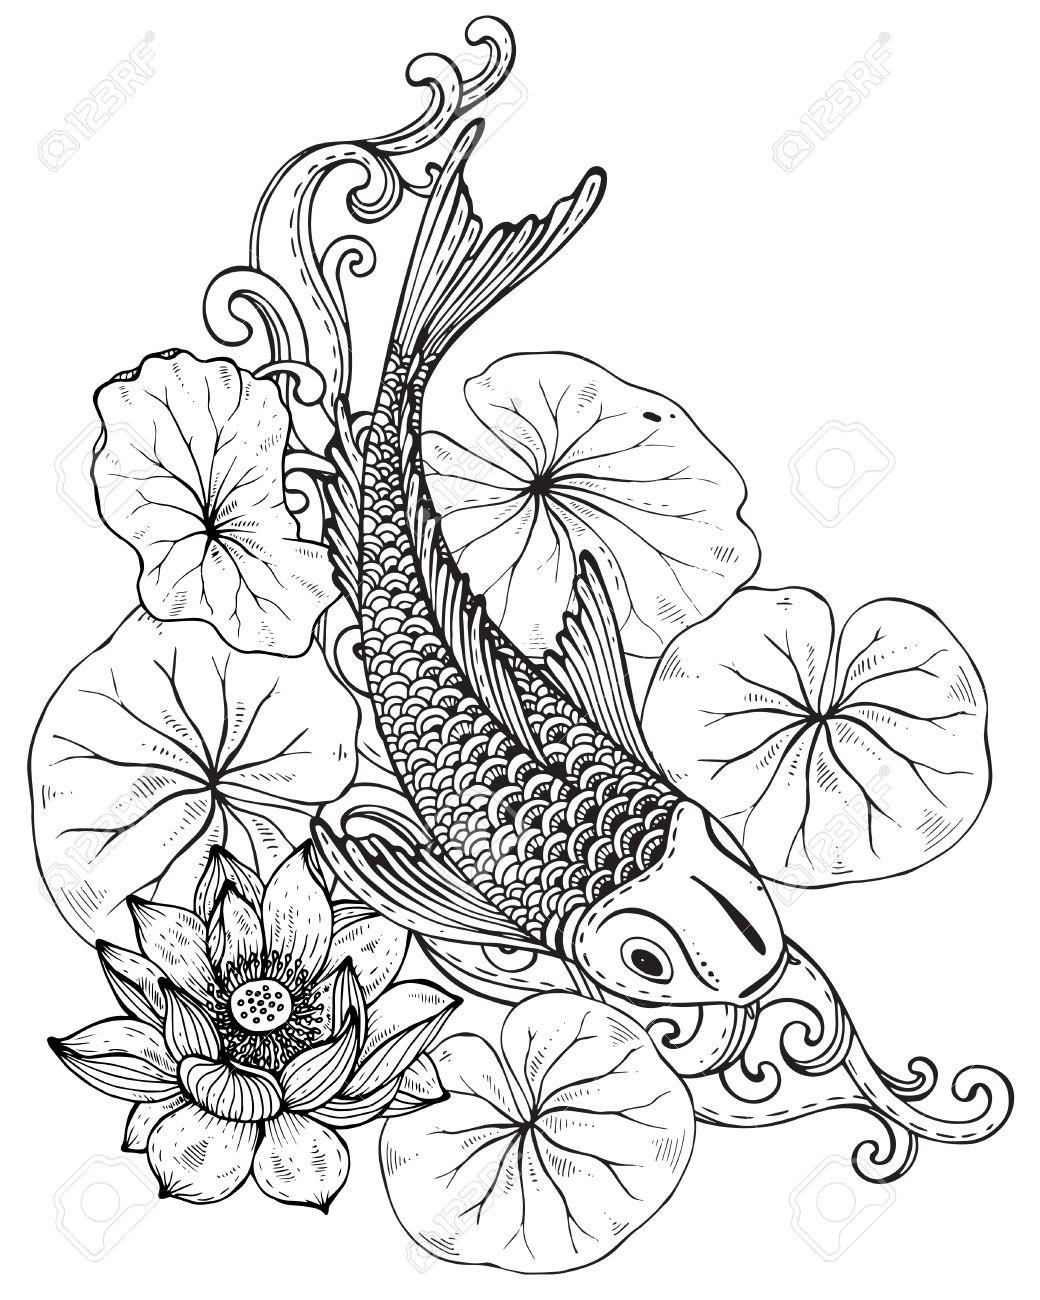 1040x1300 Hand Drawn Vector Illustration Of Koi Fish (Japanese Carp)